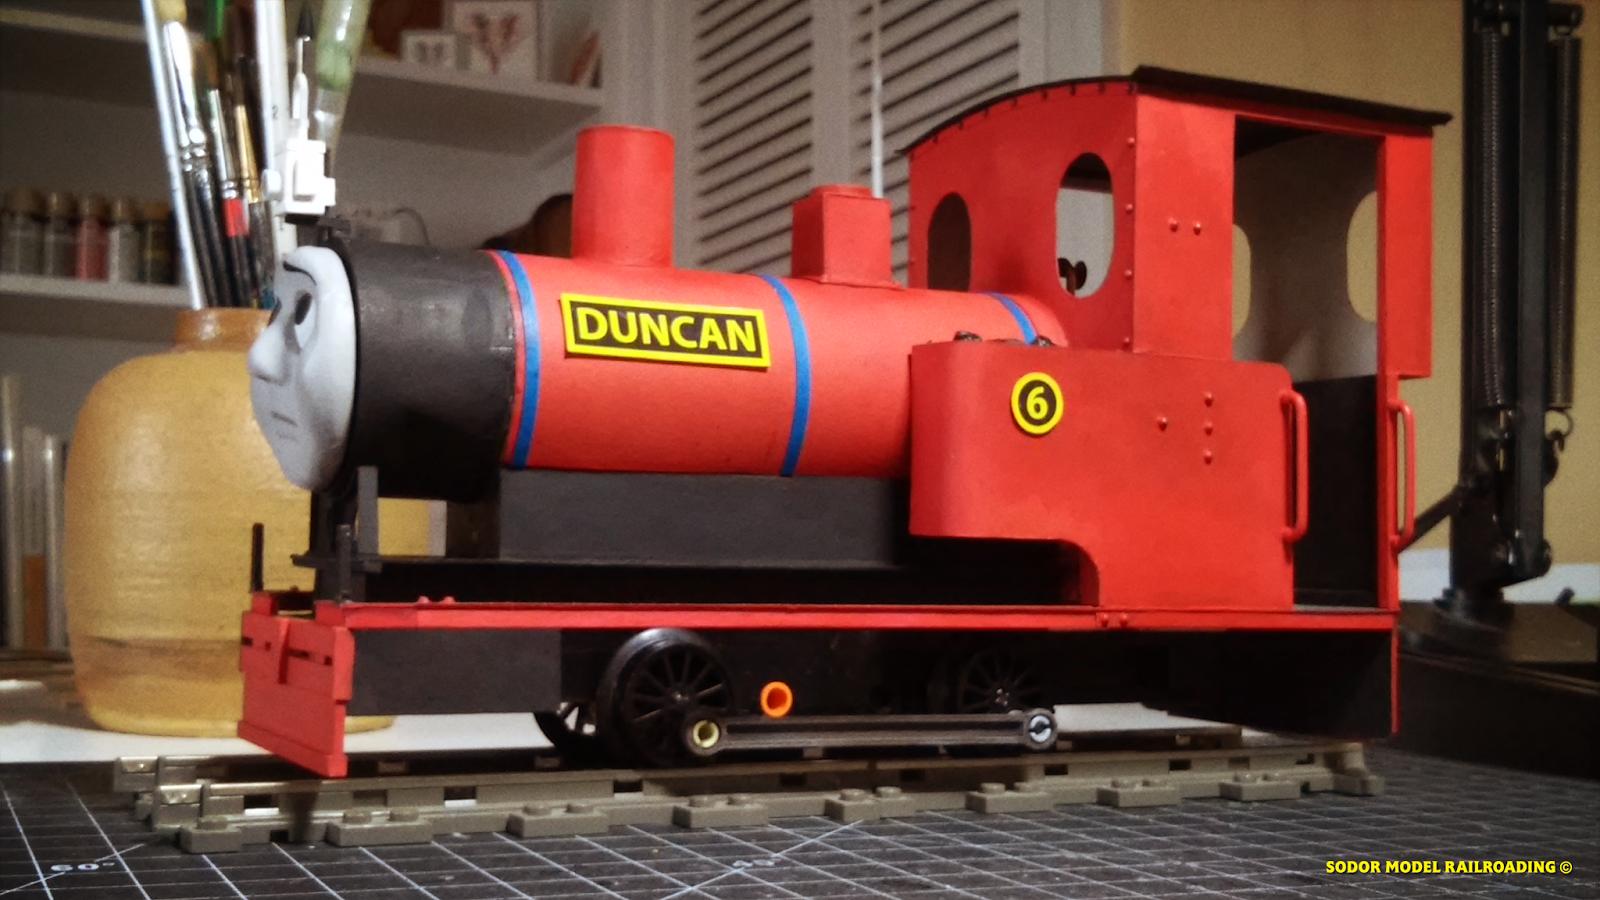 Sodormodelrailroading Scratch Building Duncan 16mm Scale